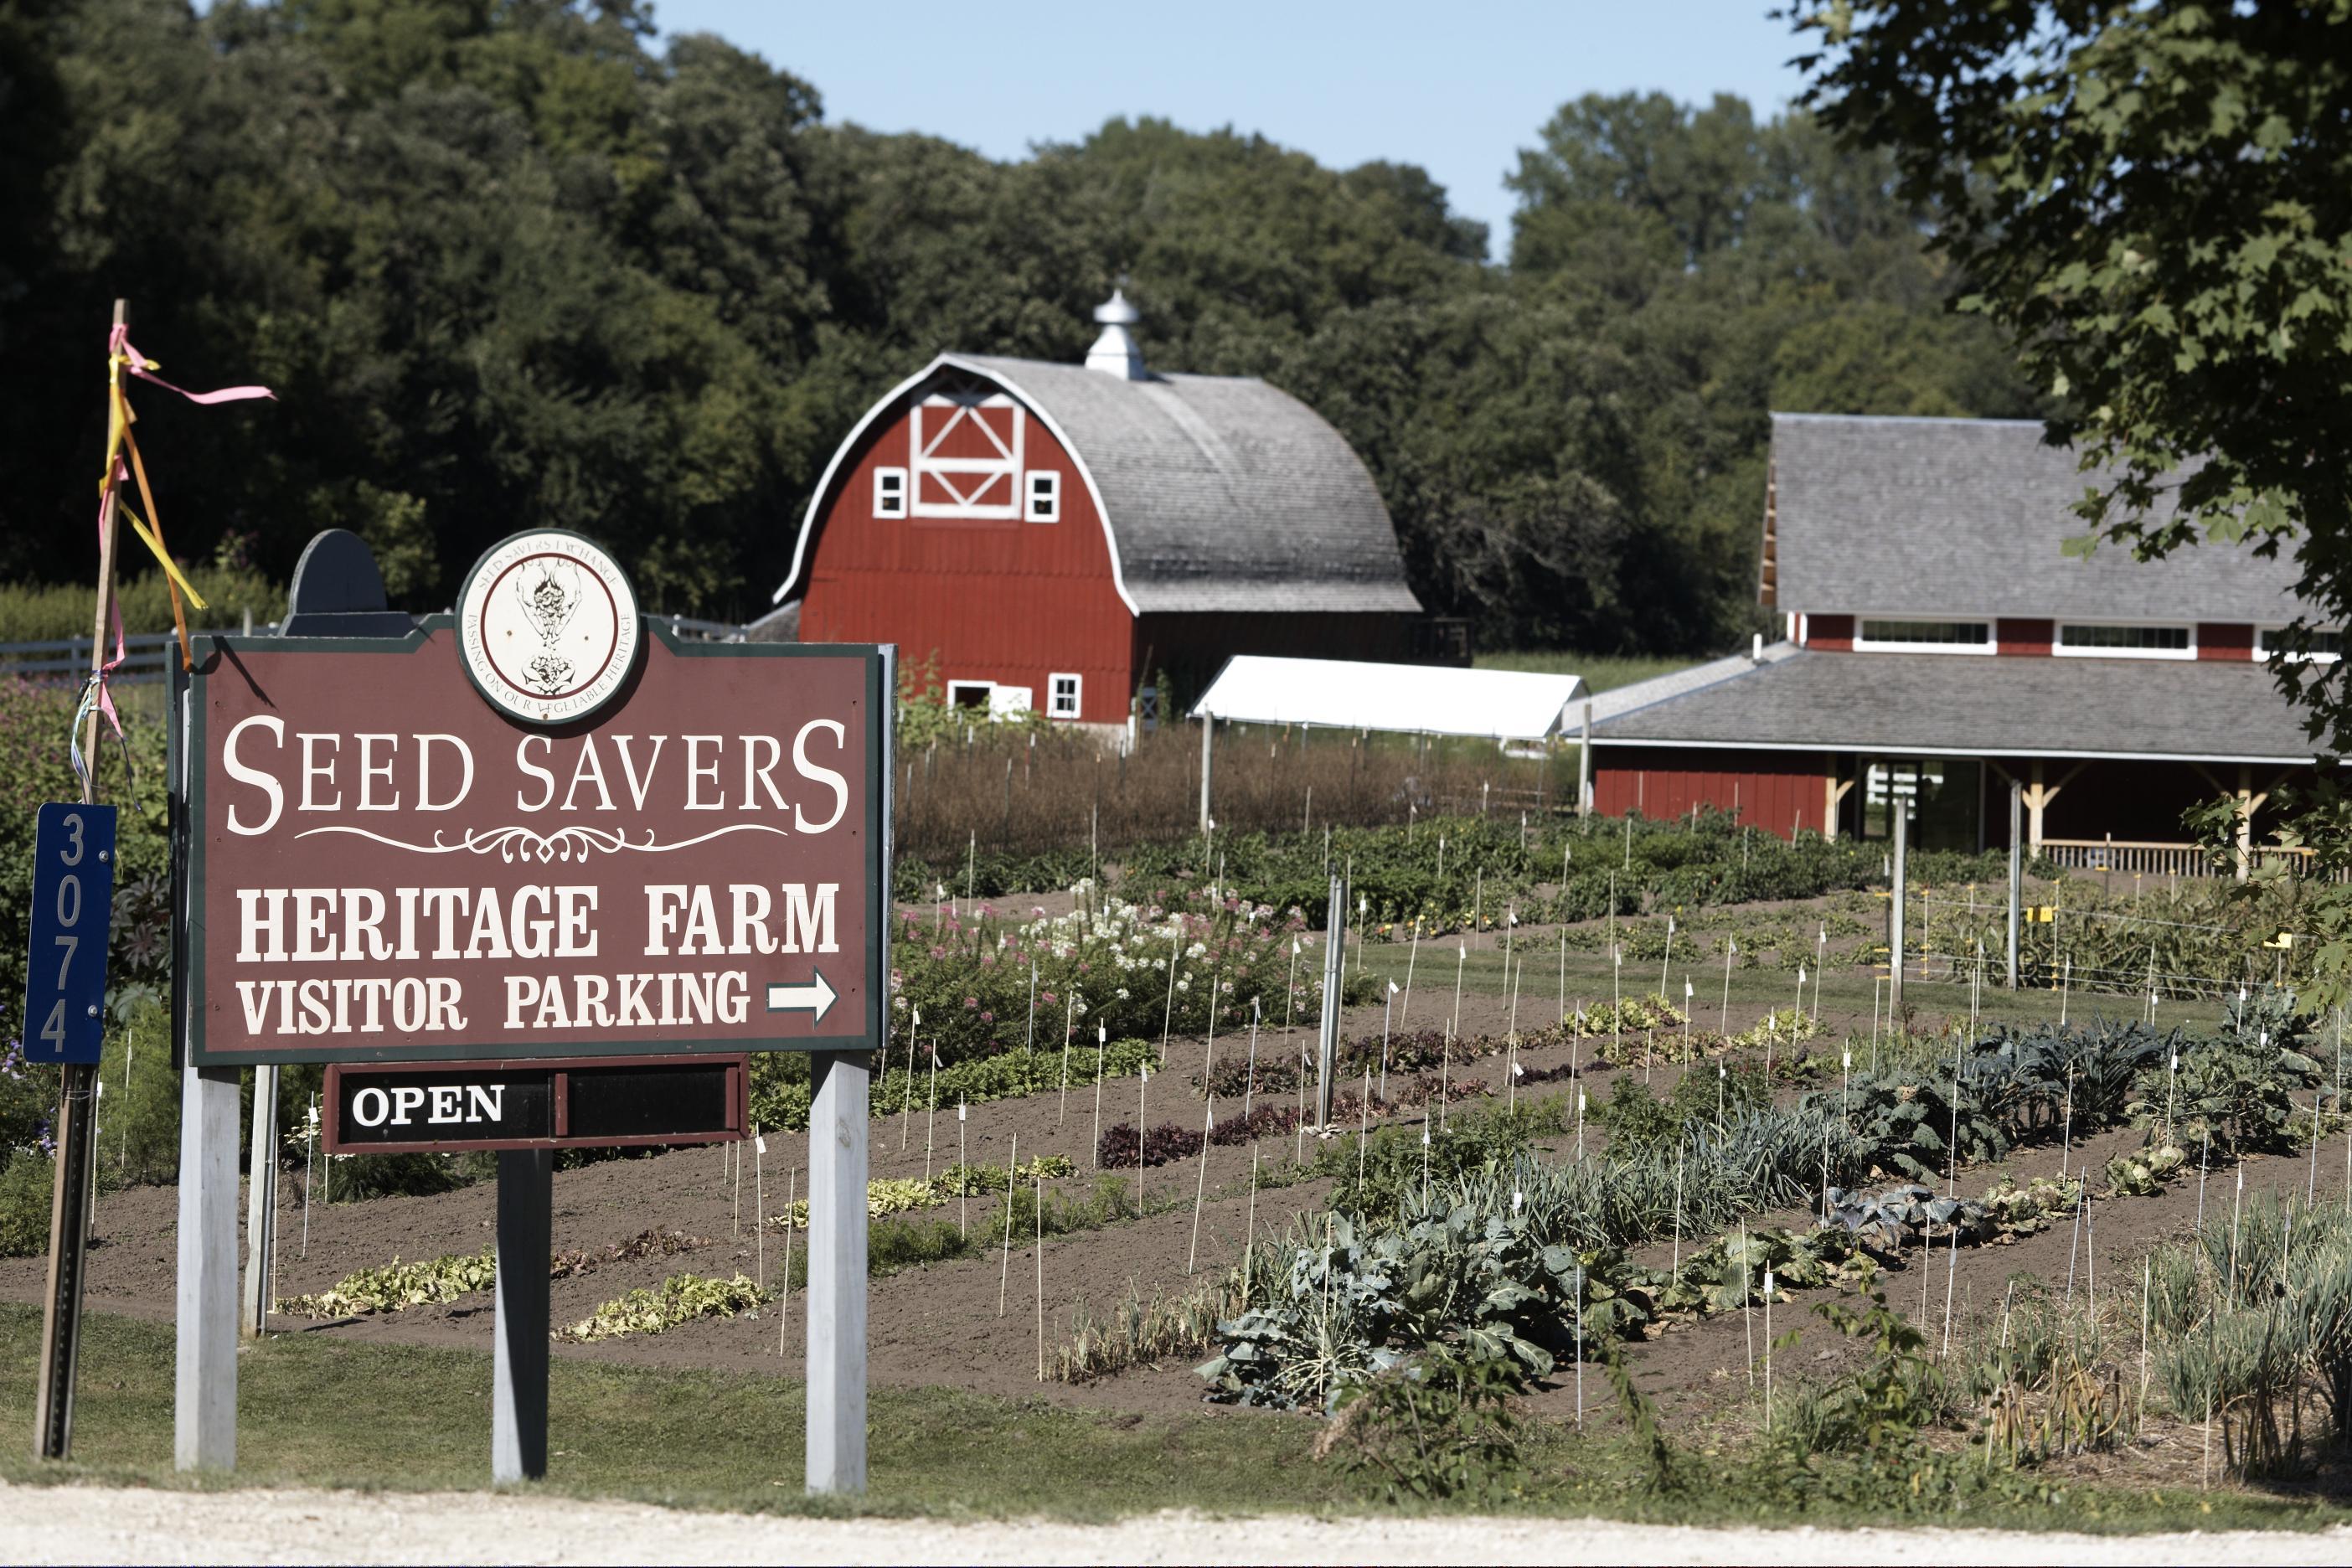 Decorah's Seed Savers Heritage Farm.